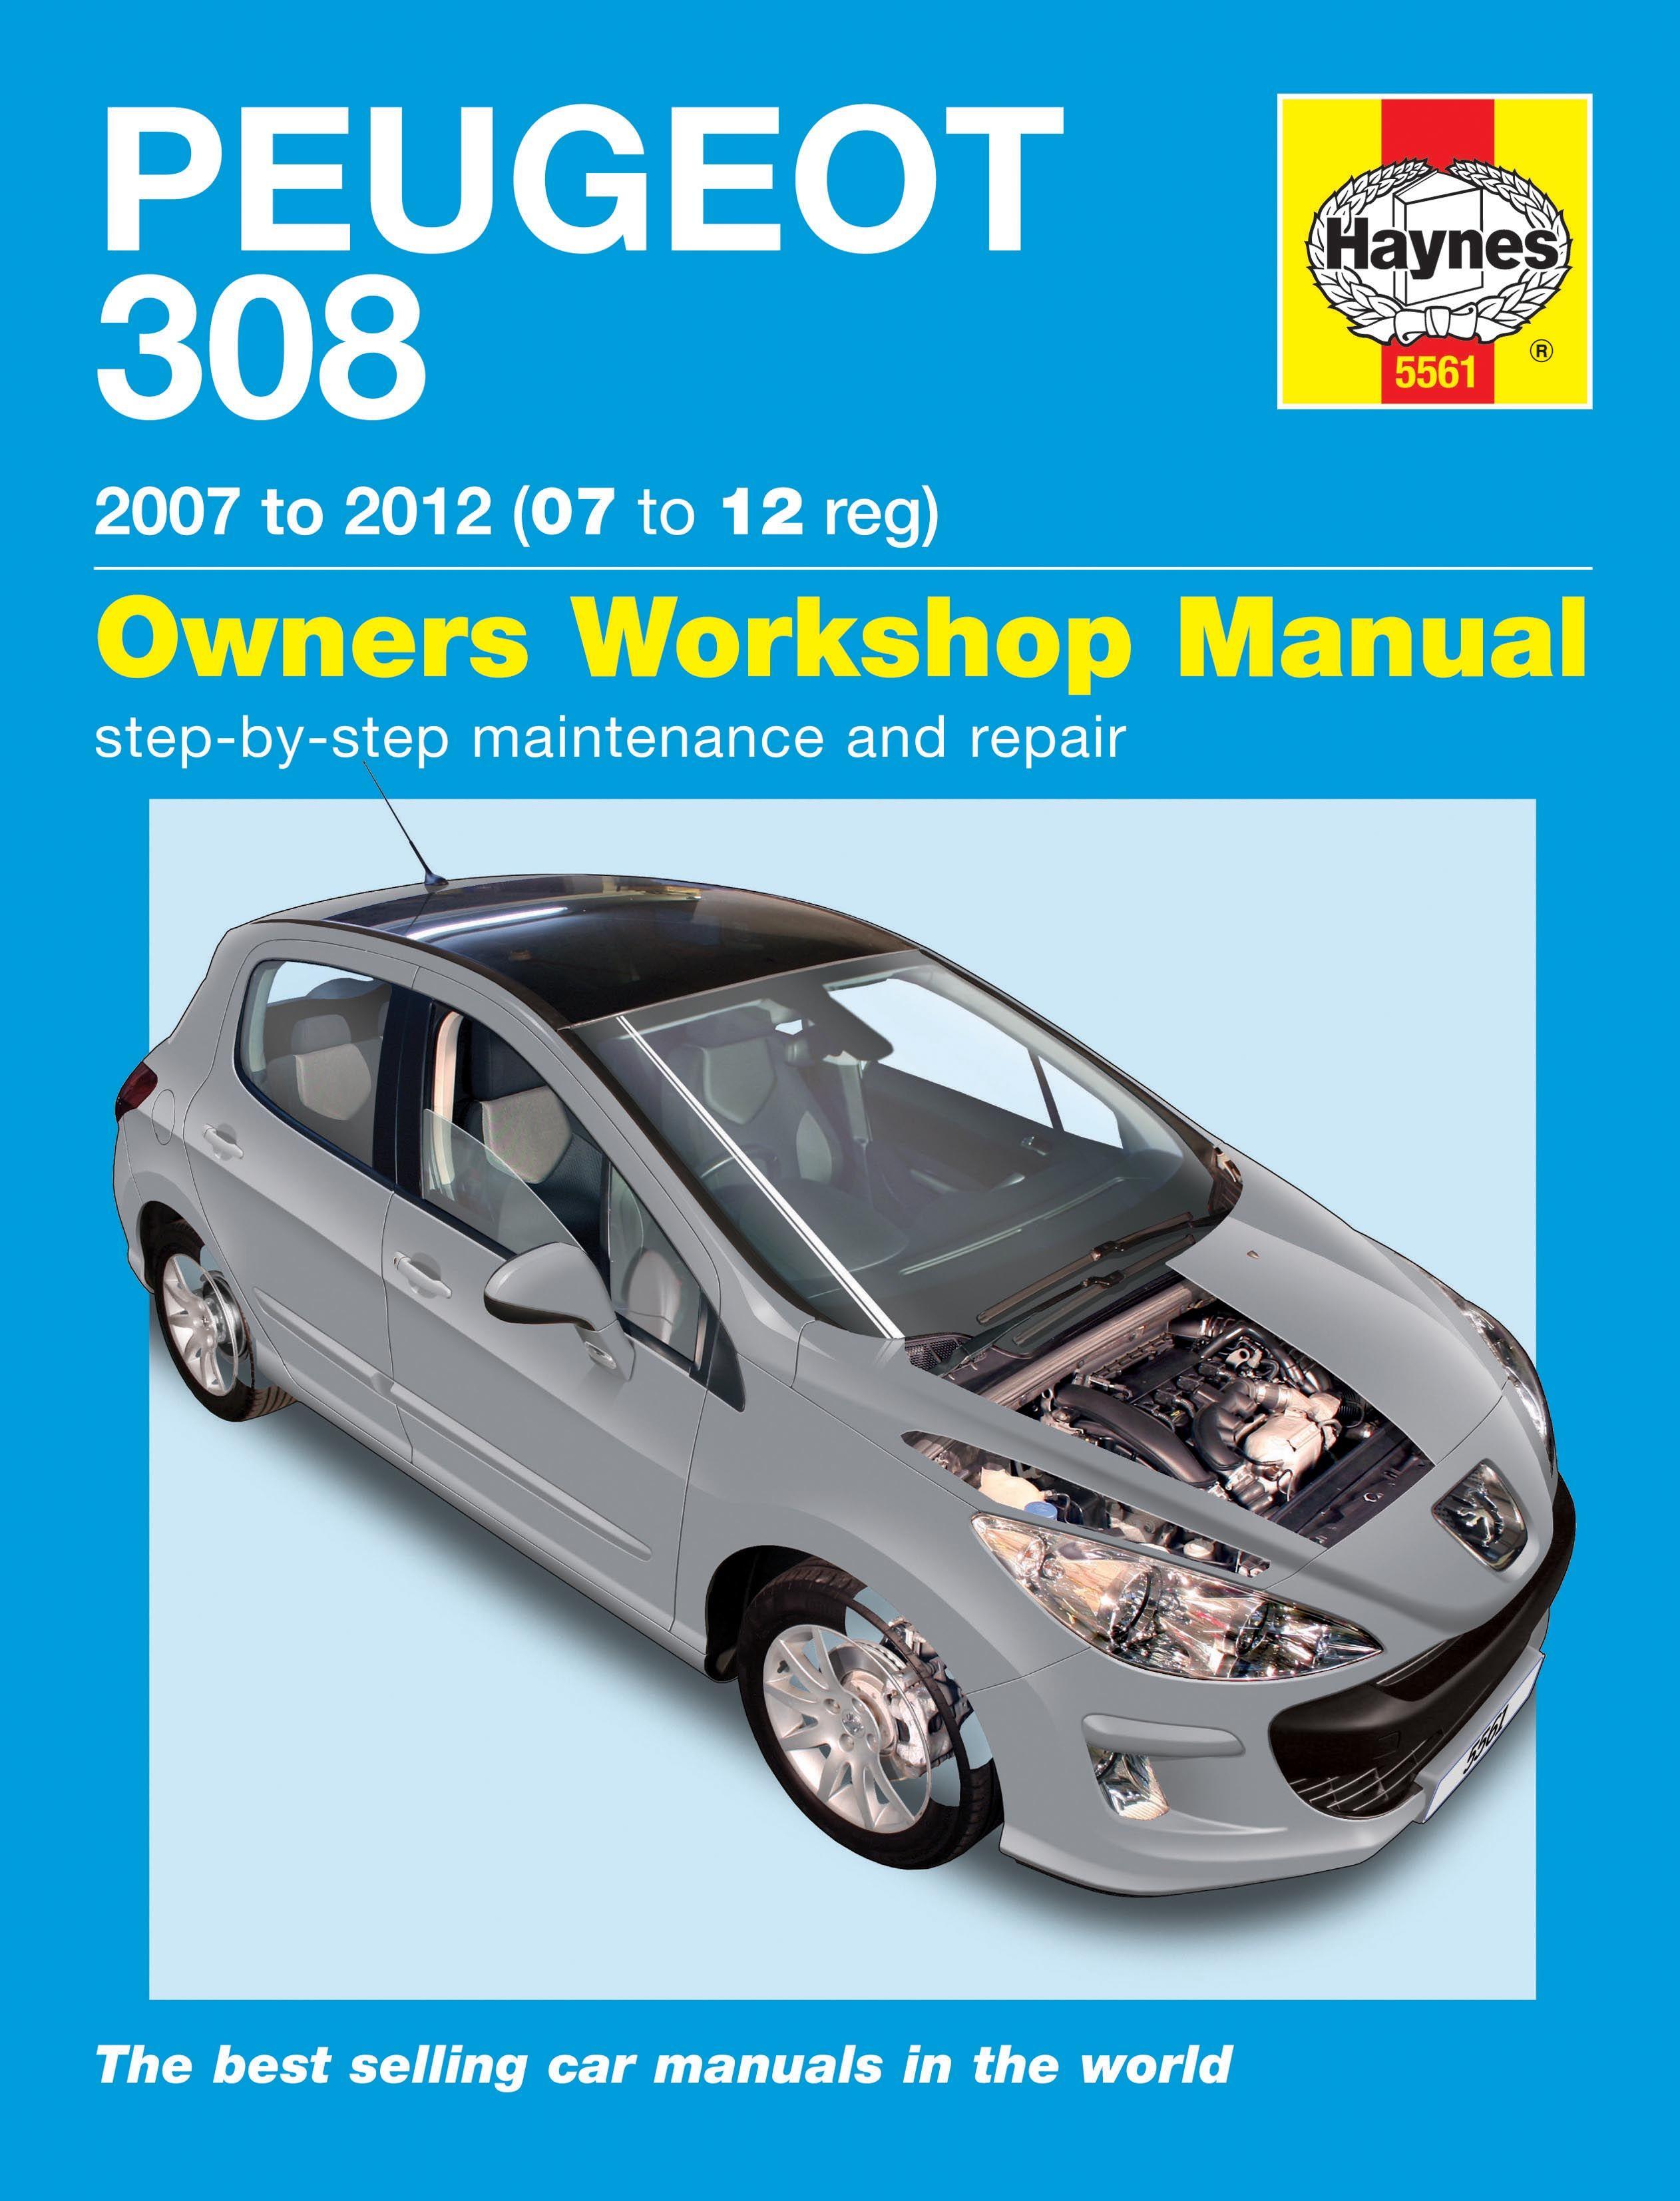 haynes workshop car repair owners manual peugeot 308 petrol and diesel  [ 2524 x 3307 Pixel ]